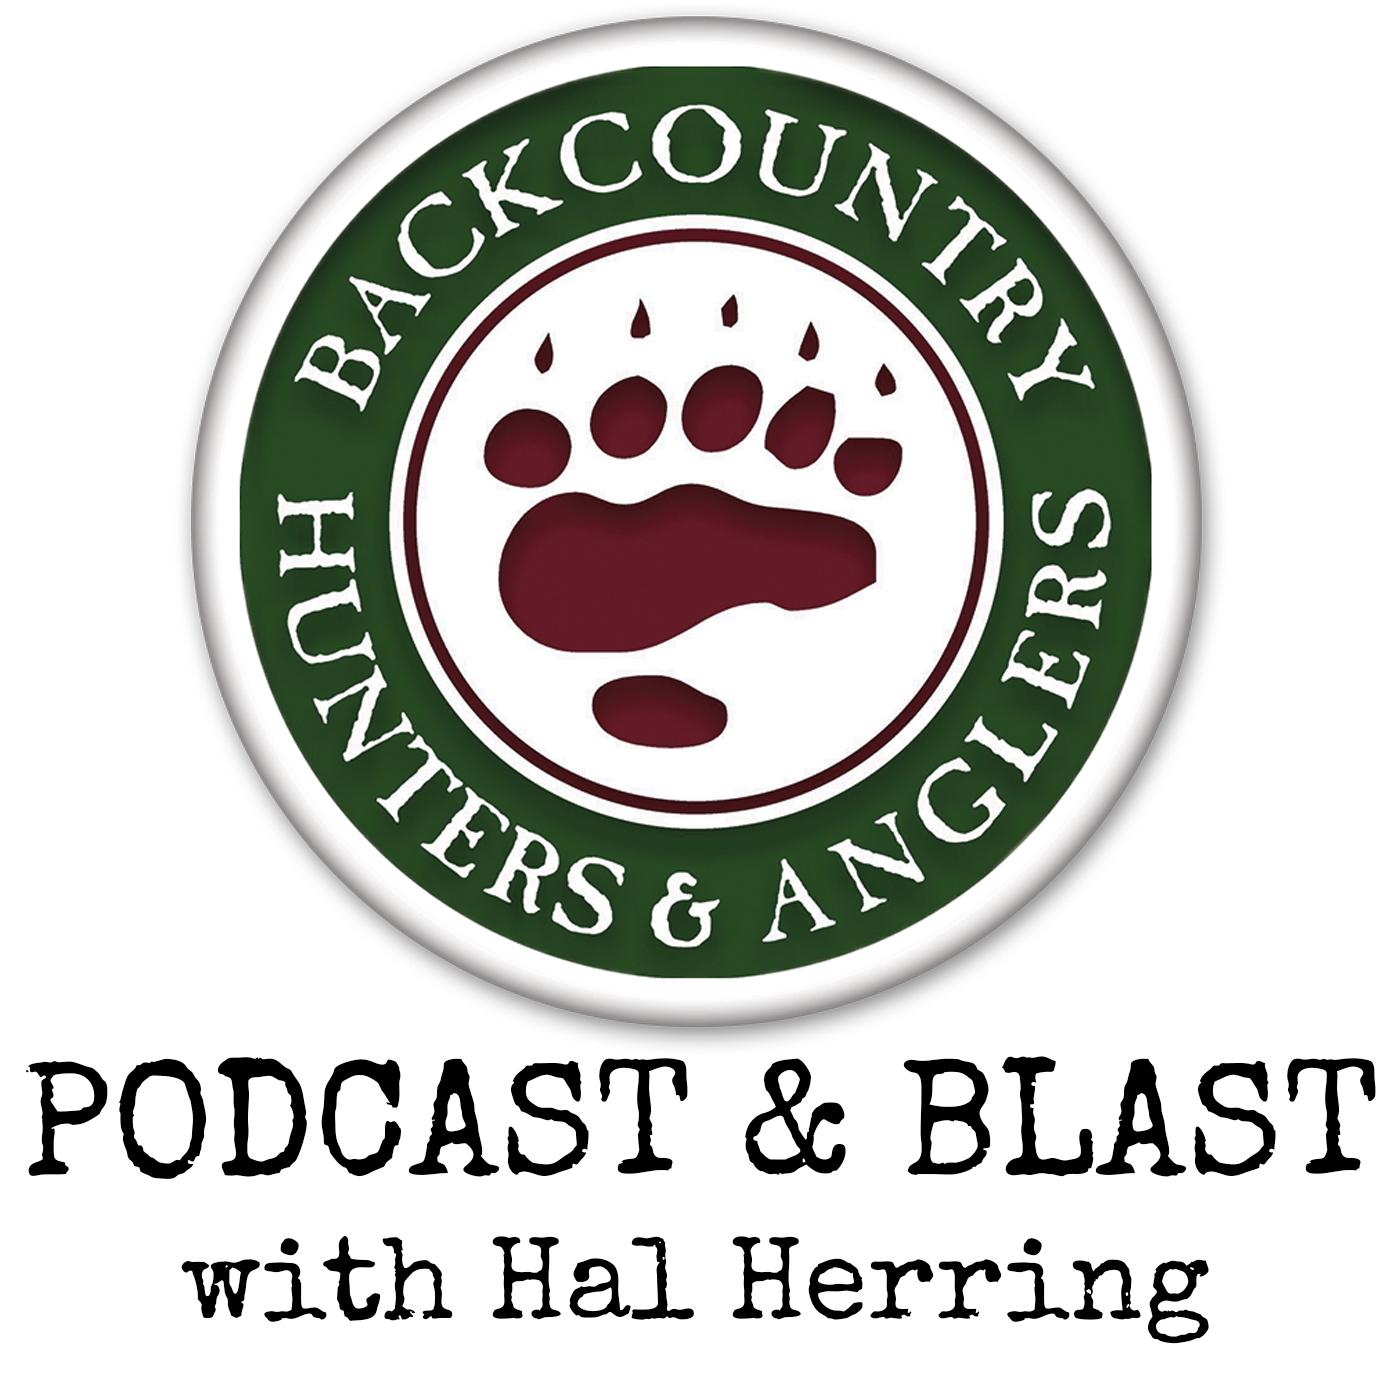 BHA Podcast & Blast with Hal Herring show art